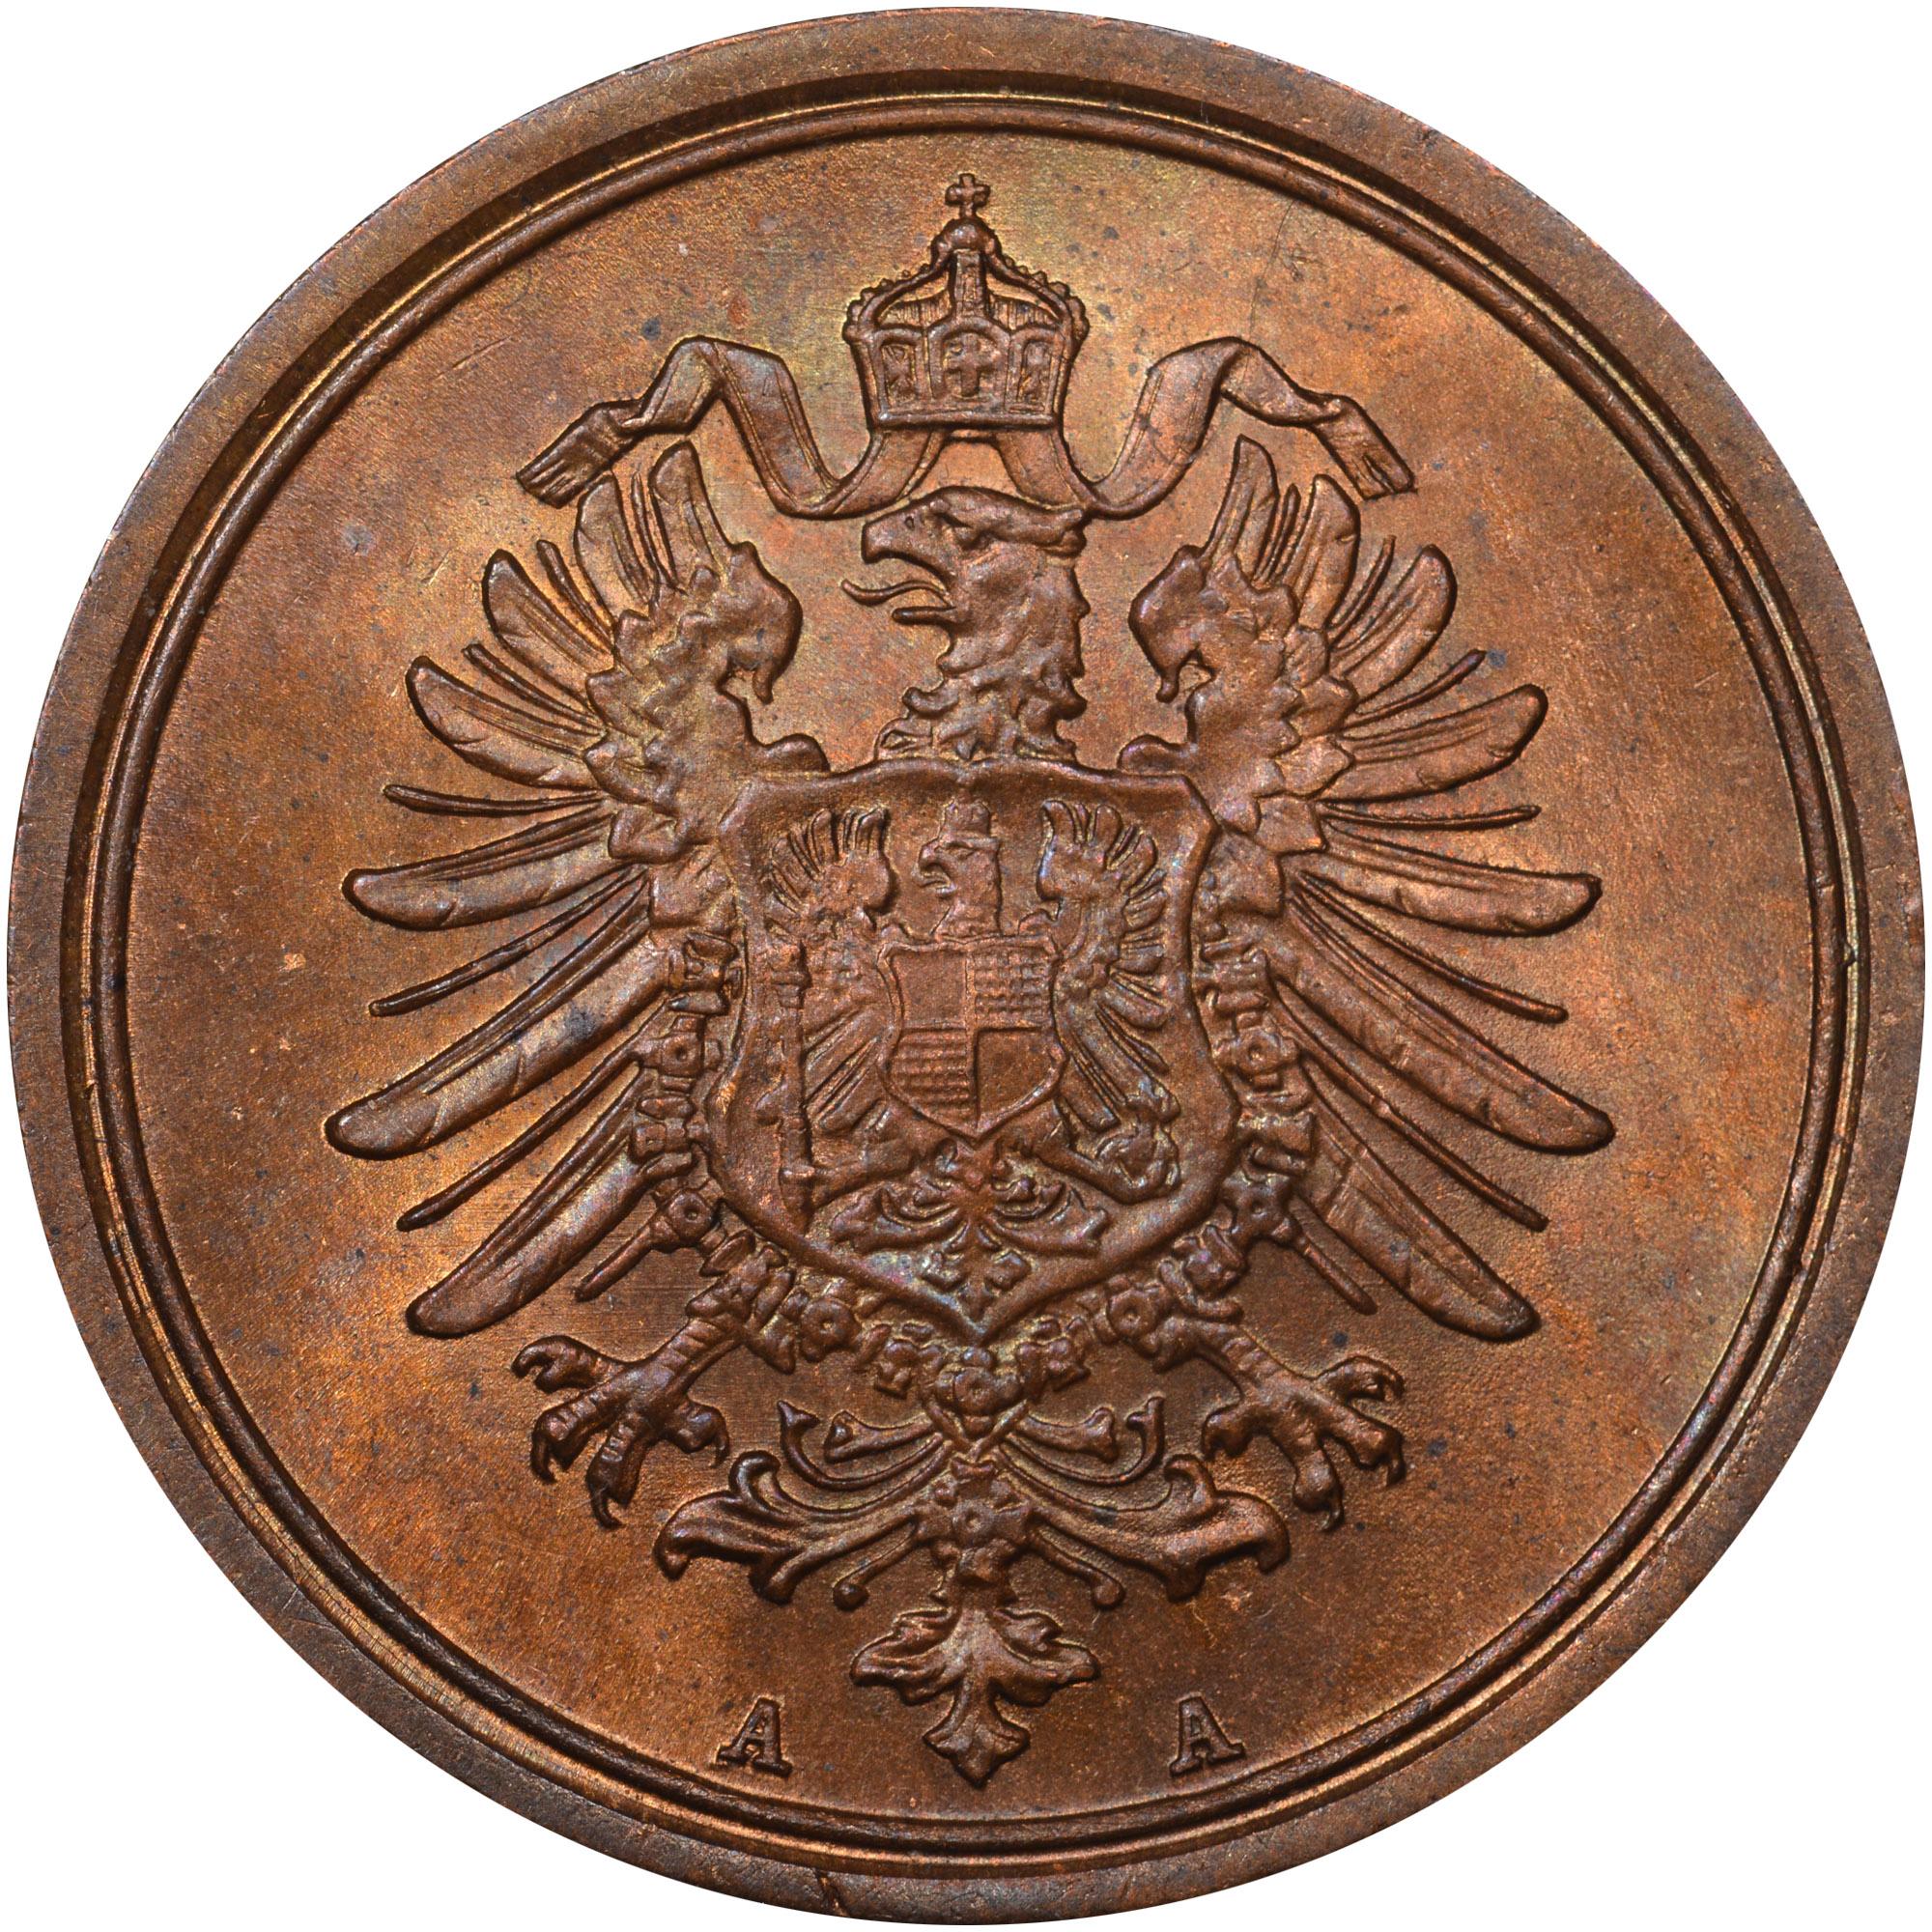 Germany - Empire Pfennig obverse